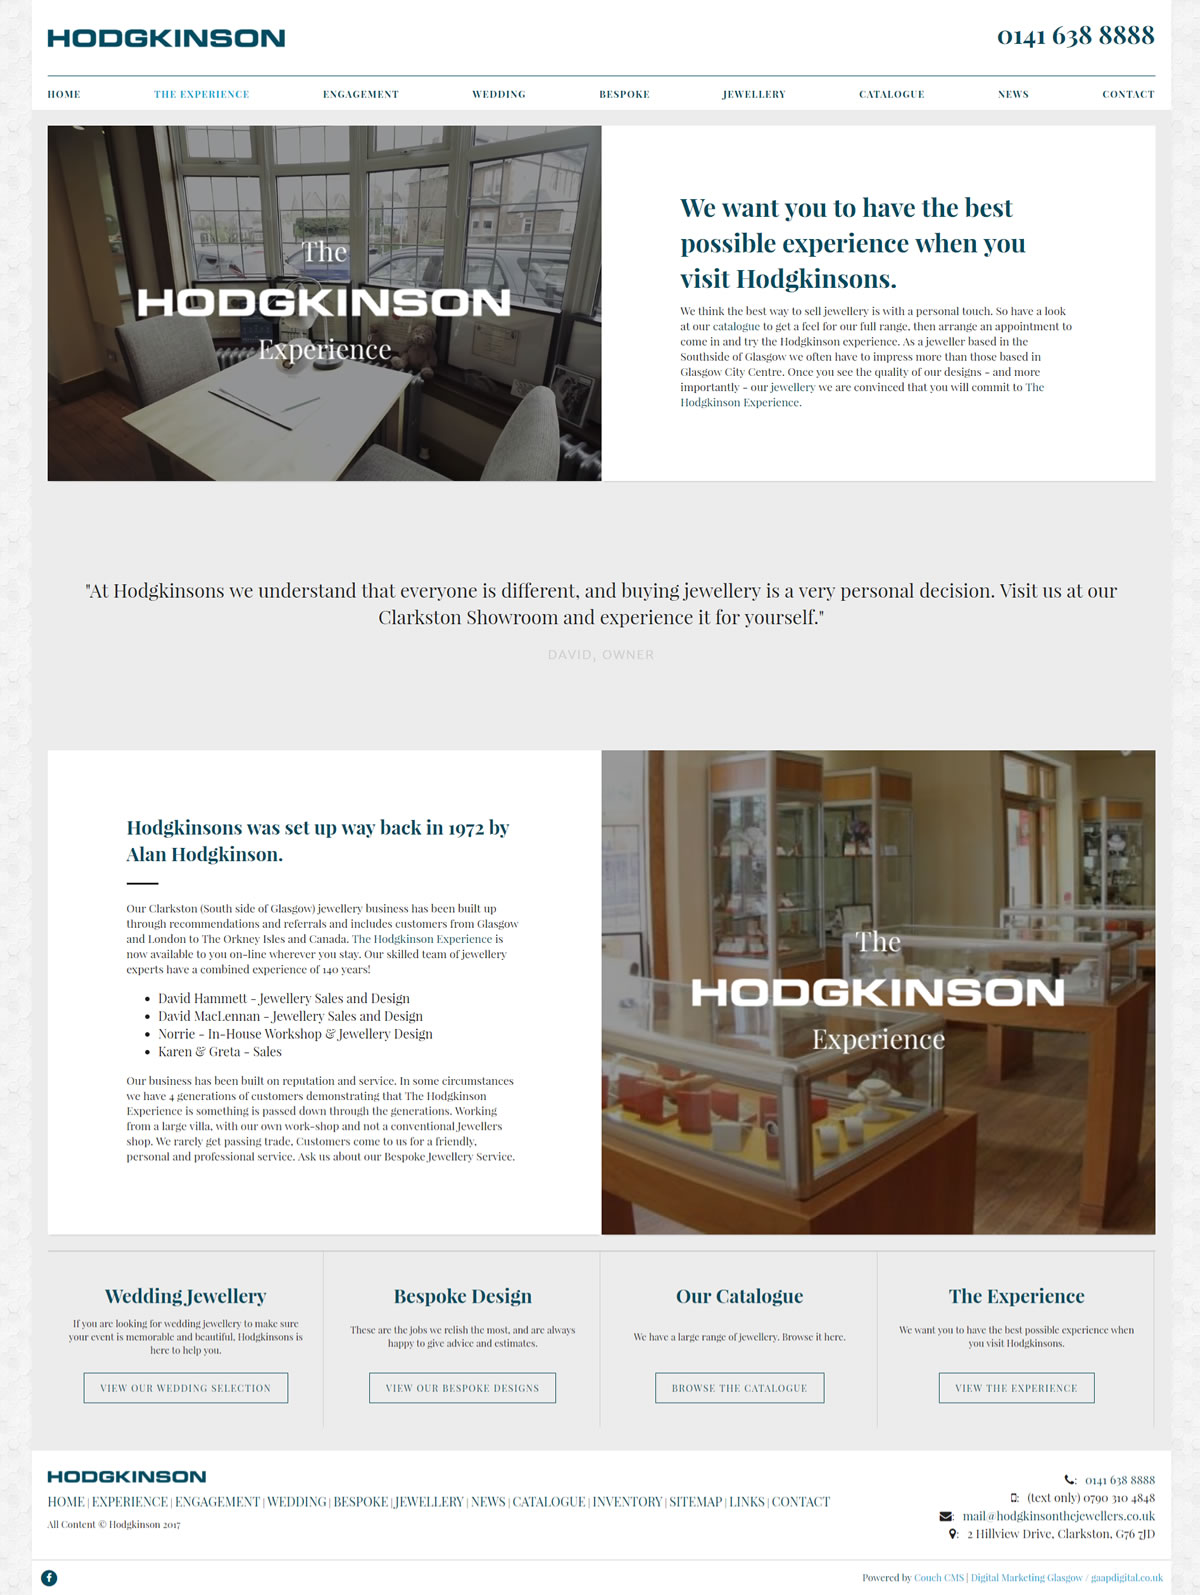 Hodgkinson Jewellers